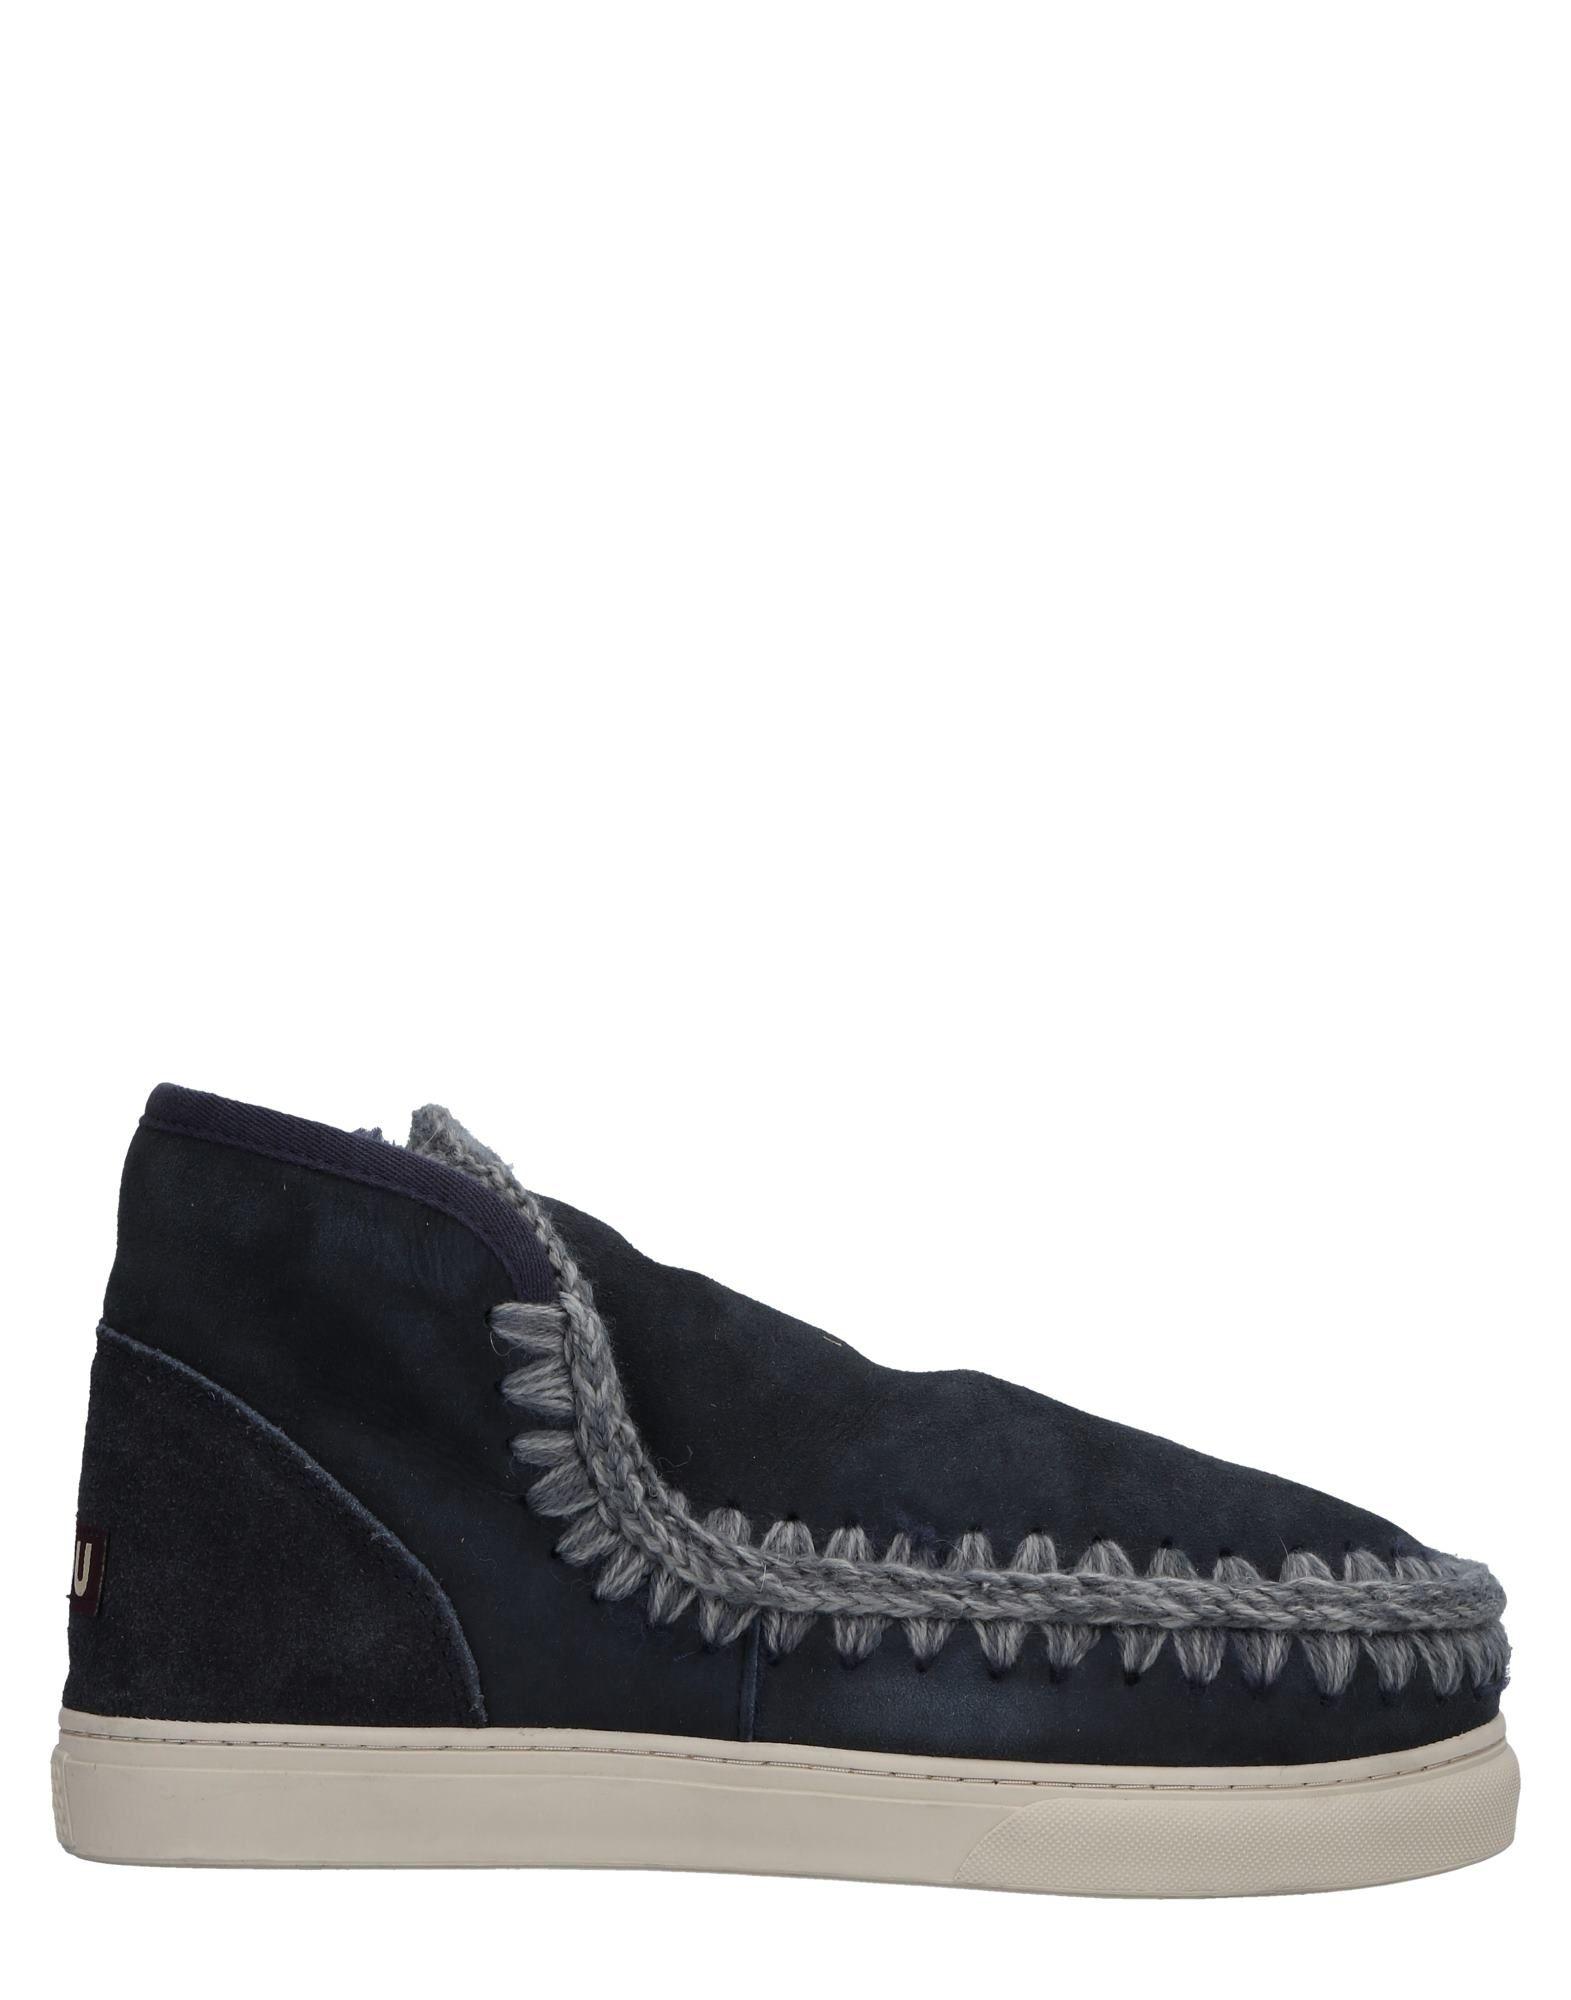 Mou Sneakers Herren  11519600VV Gute Qualität beliebte Schuhe